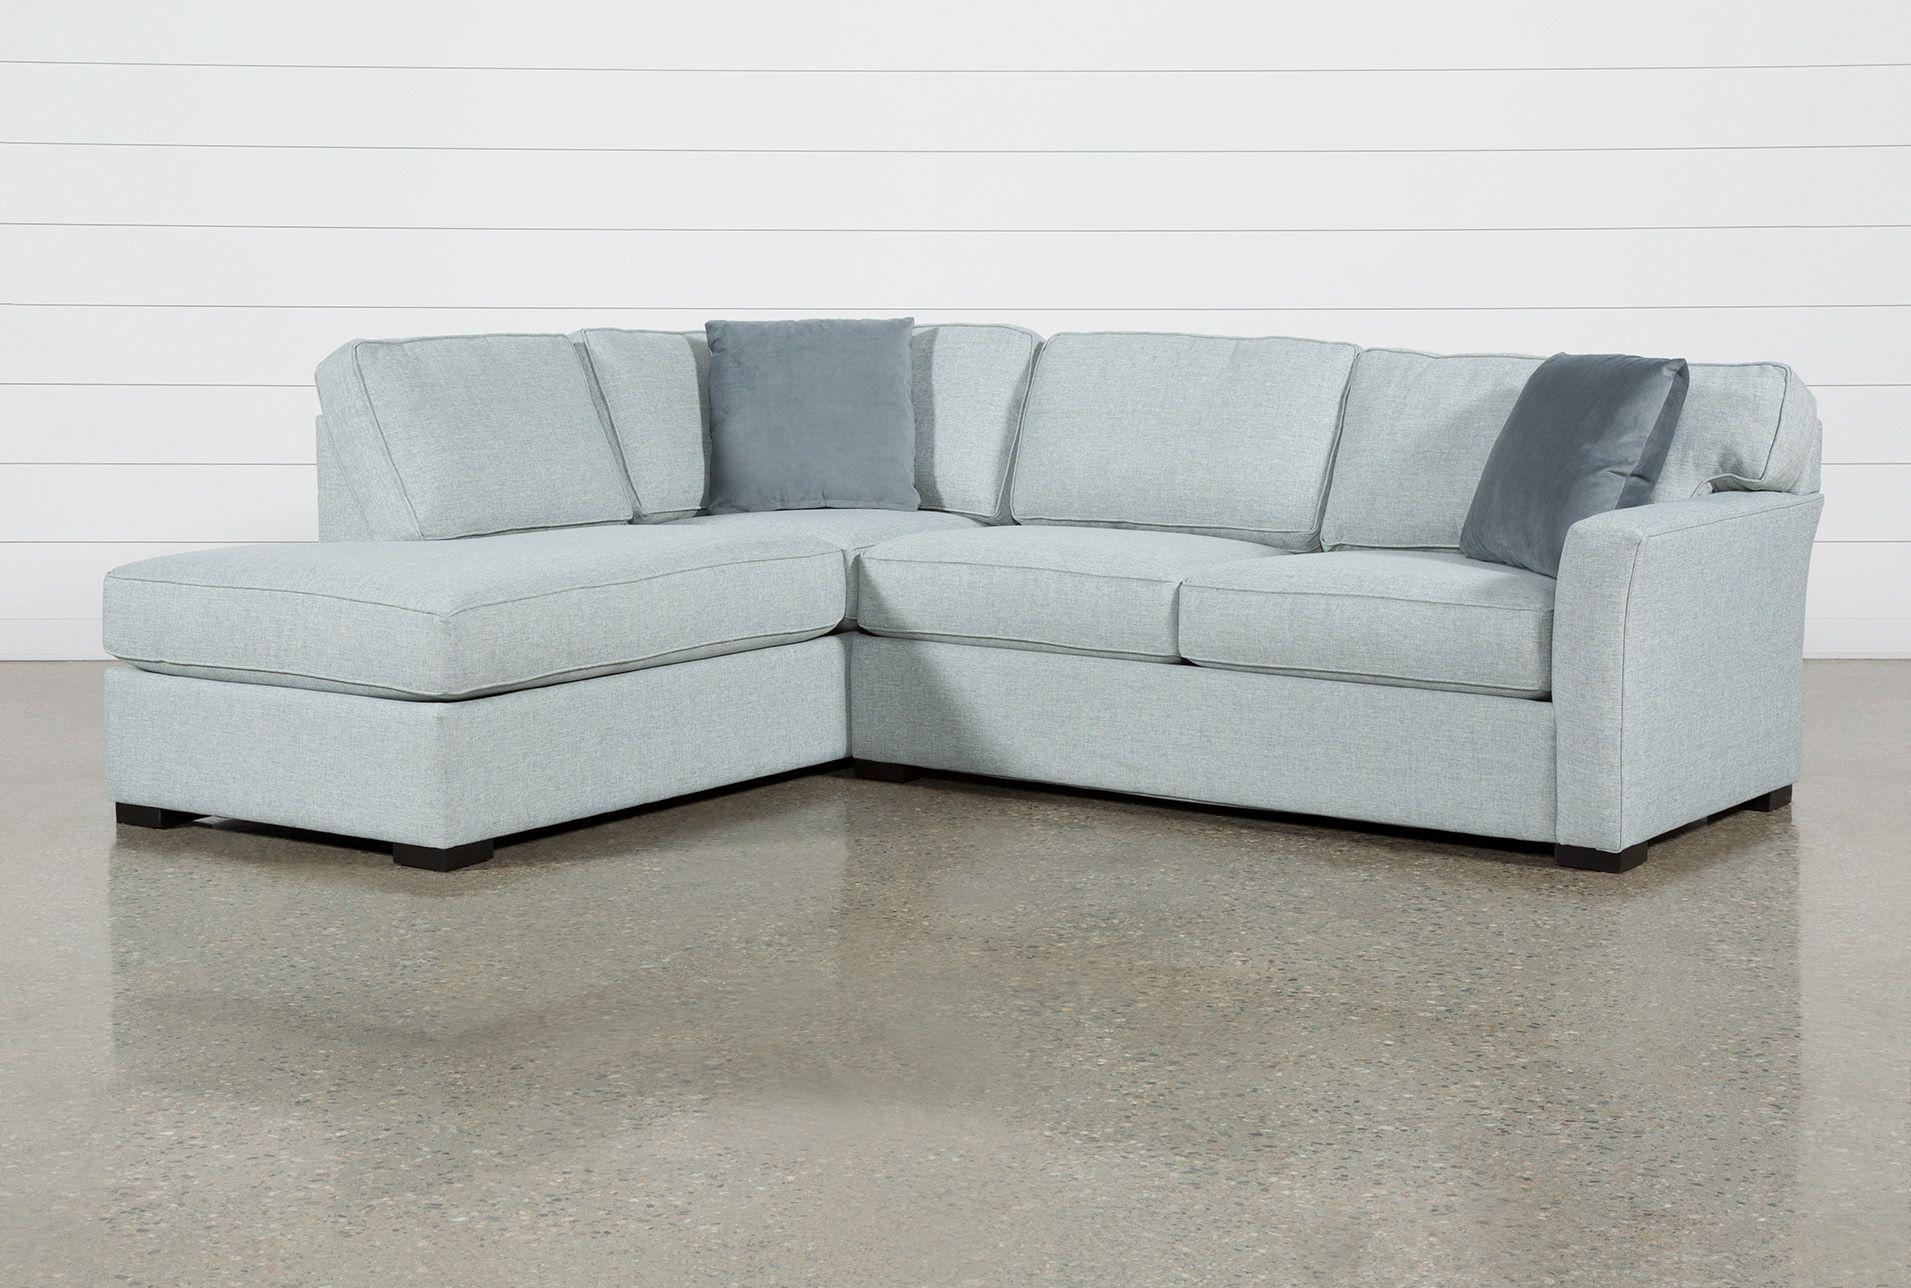 Stupendous Aspen Tranquil 2 Piece Sleeper Sectional With Left Facing Short Links Chair Design For Home Short Linksinfo